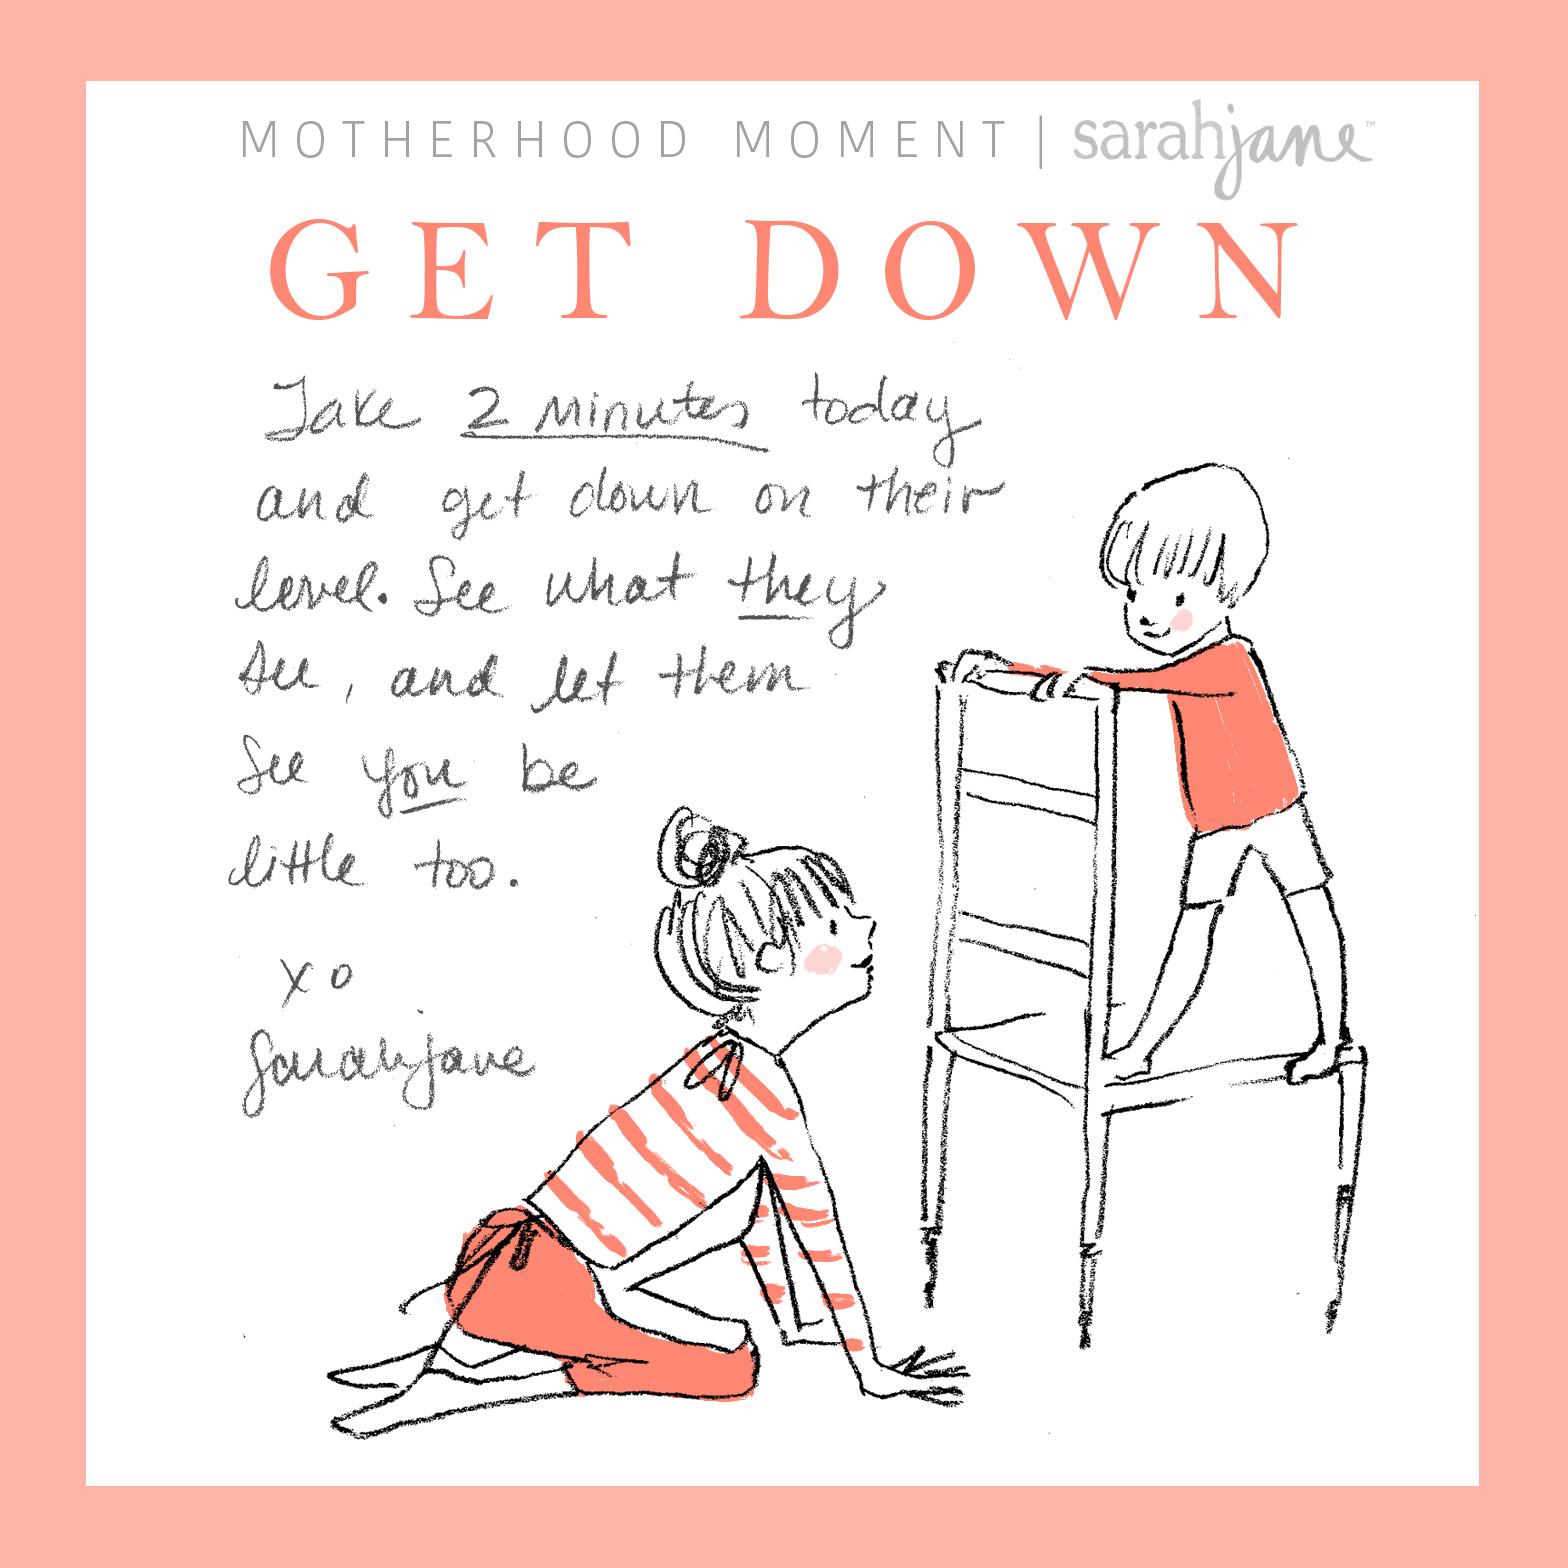 motherhood moment3.jpg